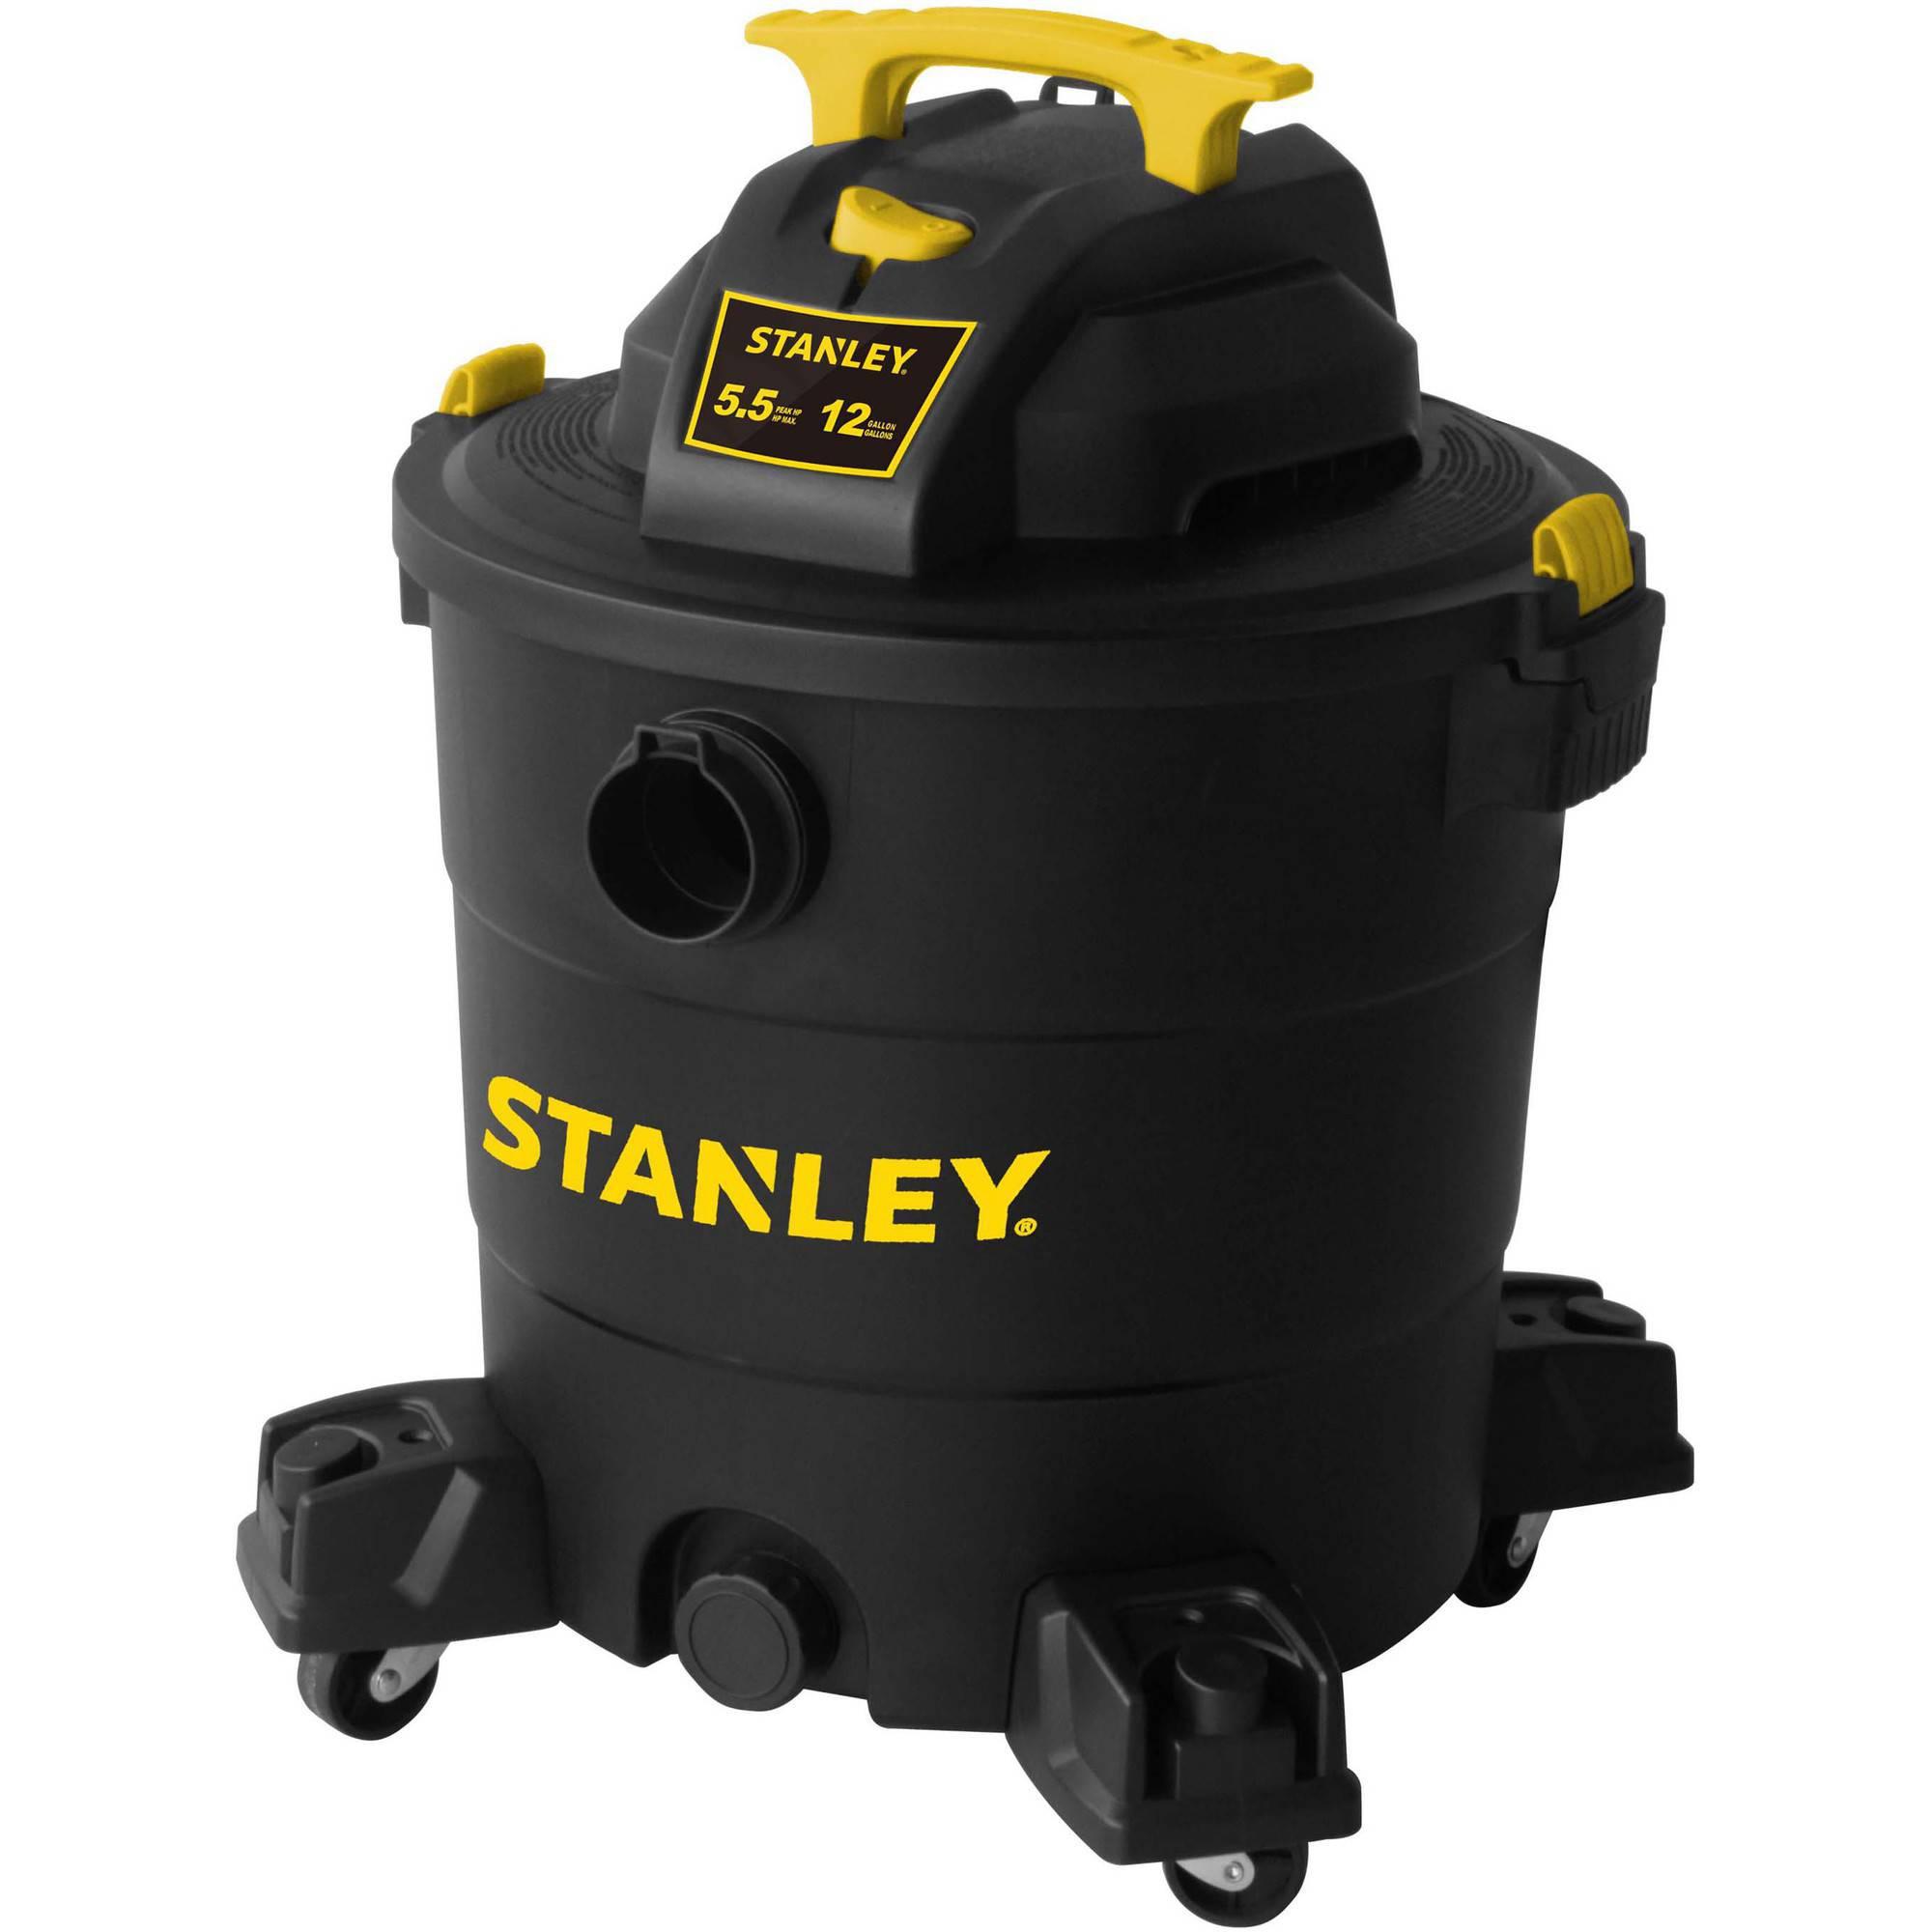 Stanley  12 gallon, 6-peak horse power, wet dry vaccum